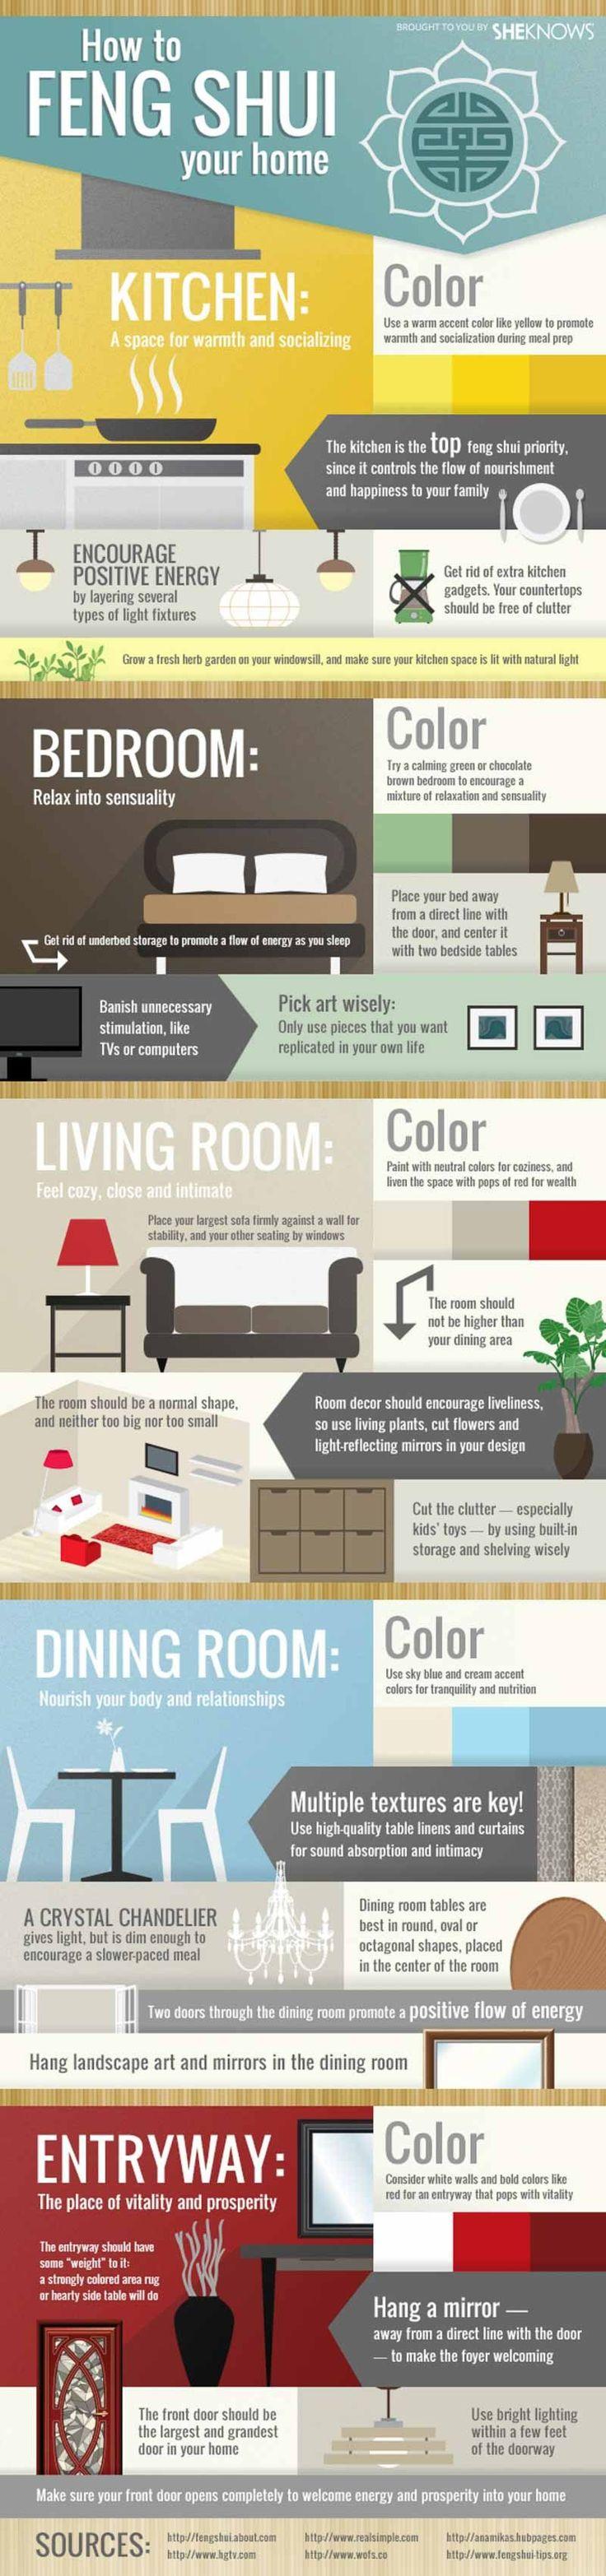 best stylish home decor images on pinterest interior decorating